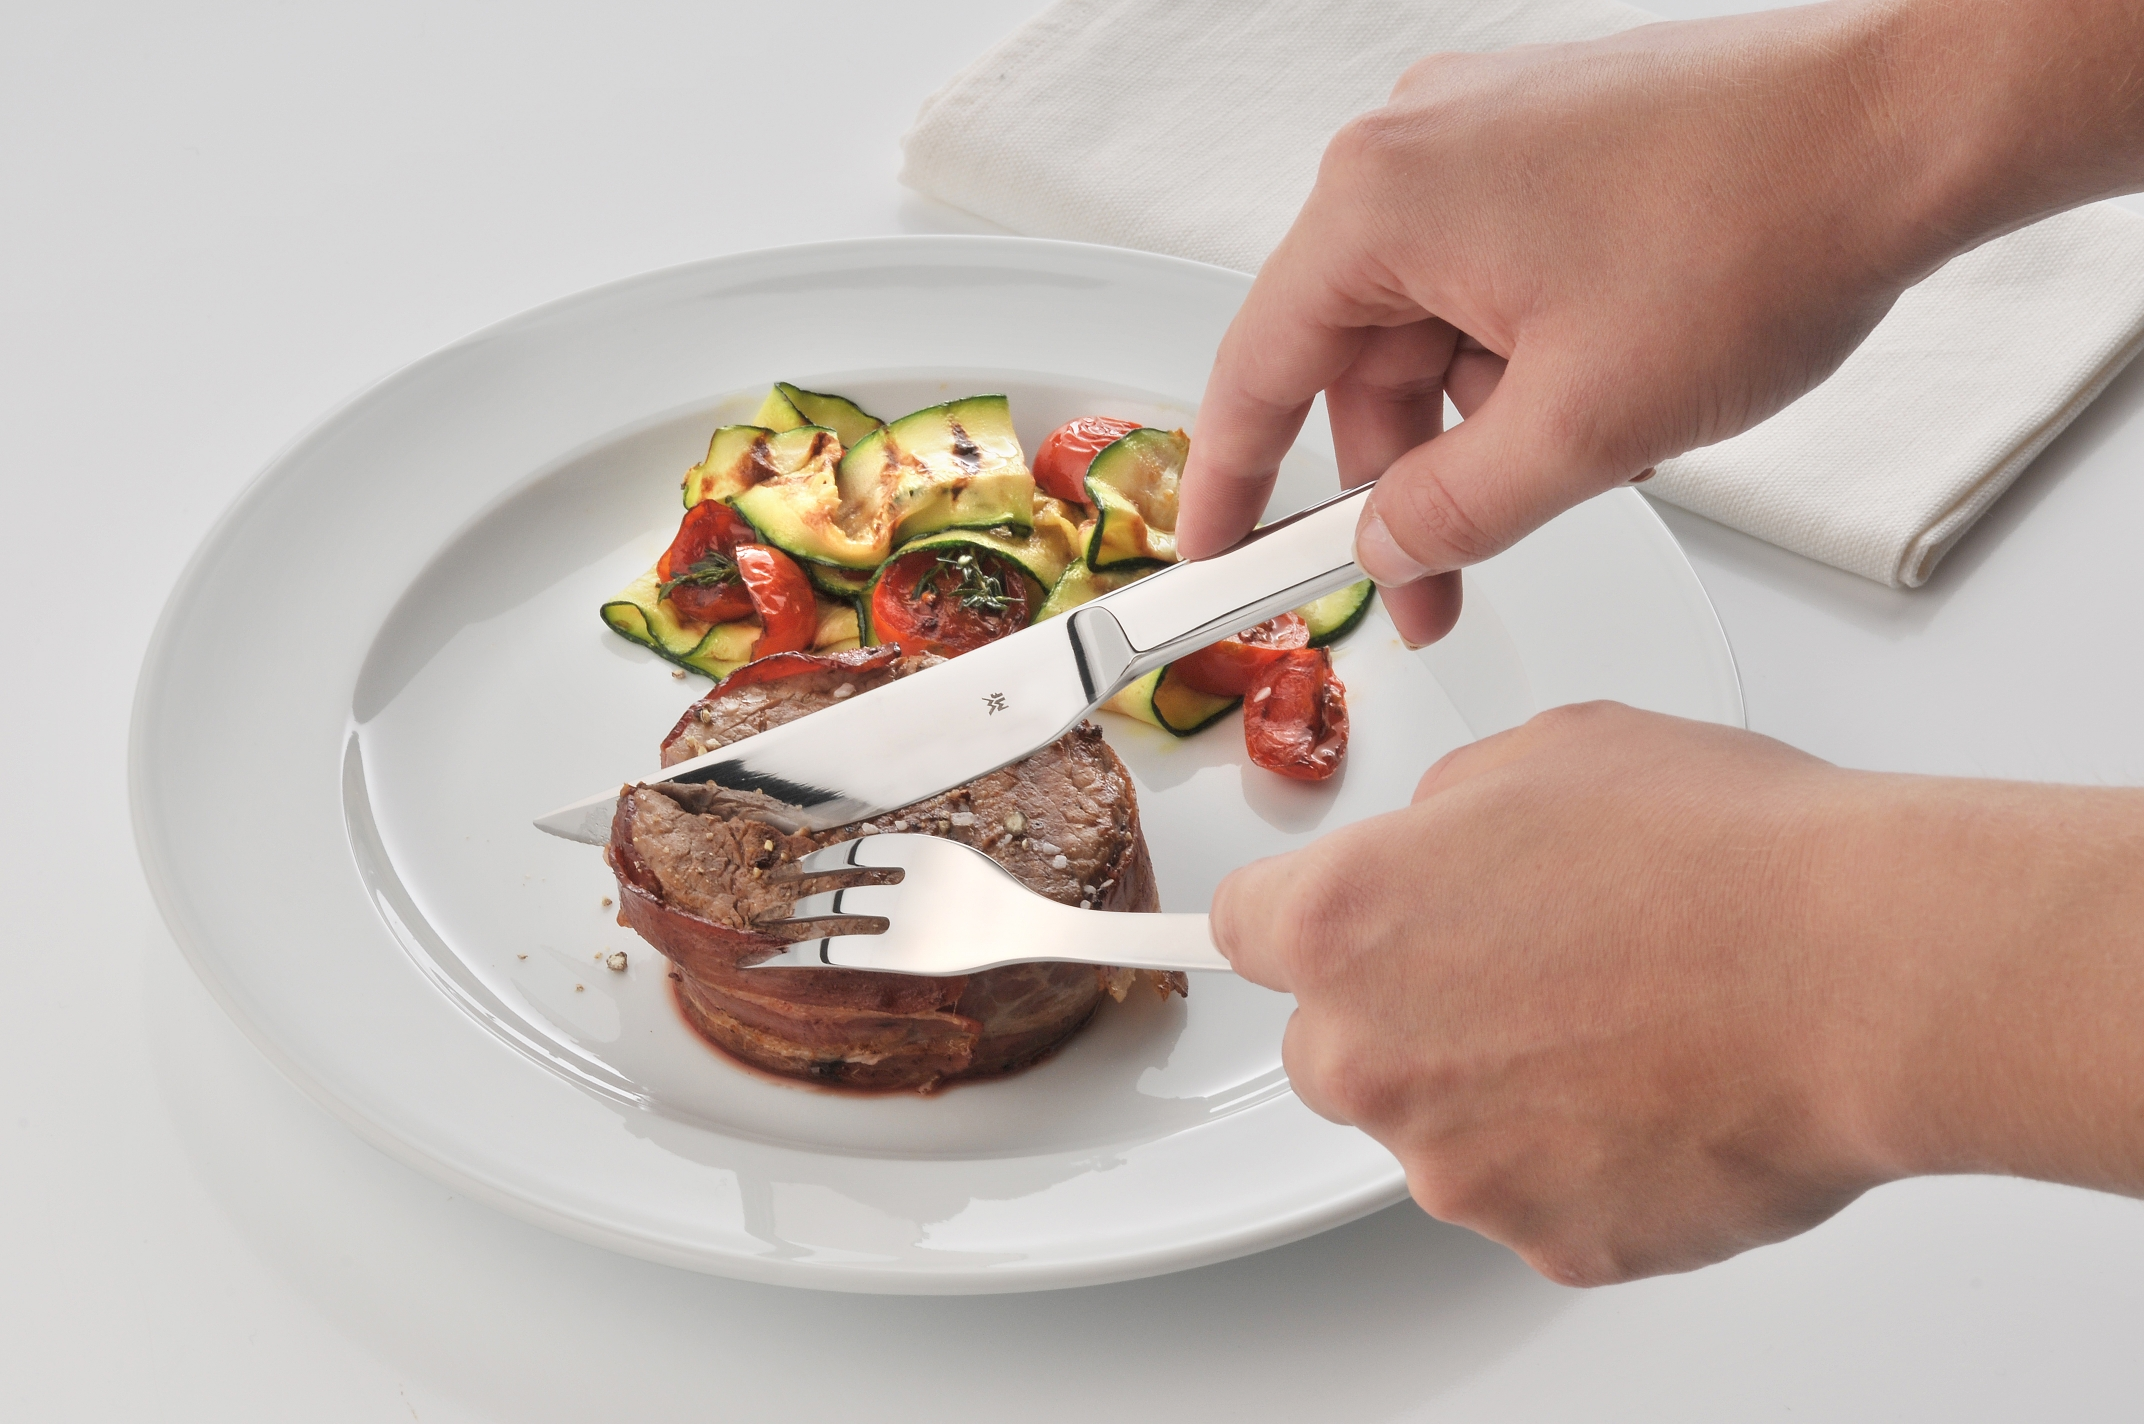 WMF Nuova Et/Pizza Çatal Bıçak Seti 12 Parça